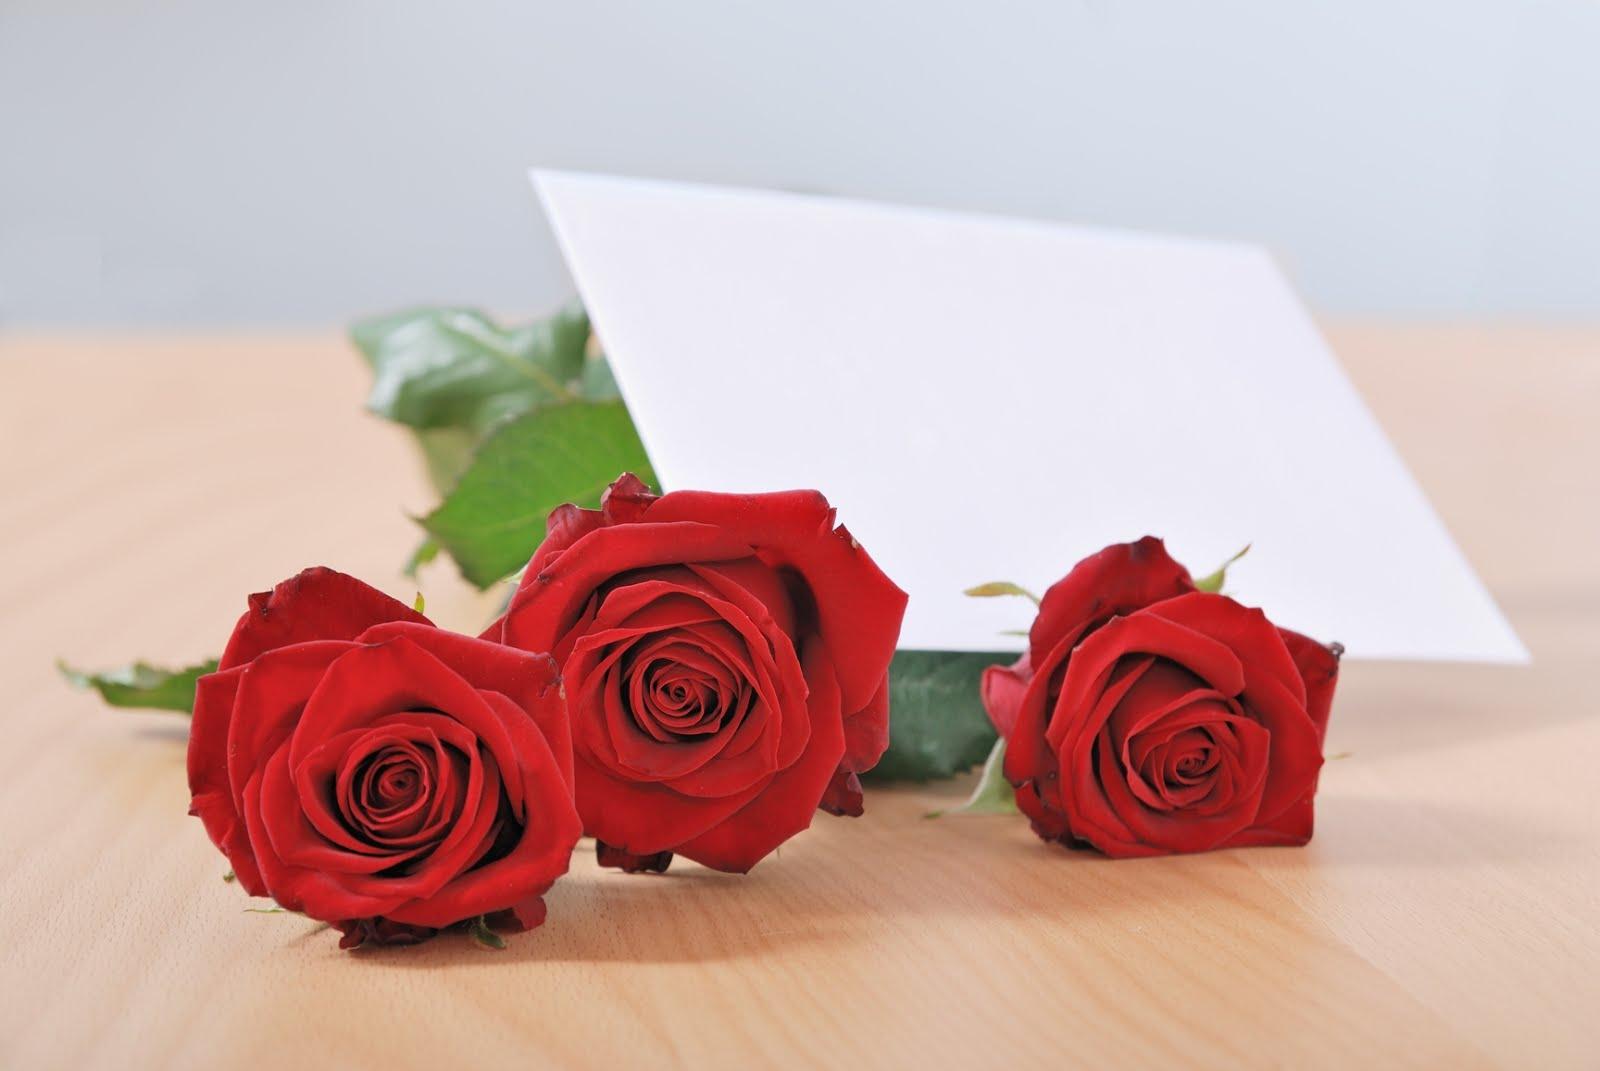 Tarjeta De Rosas De Amor Postales Rosas Rojas Rio Banco De